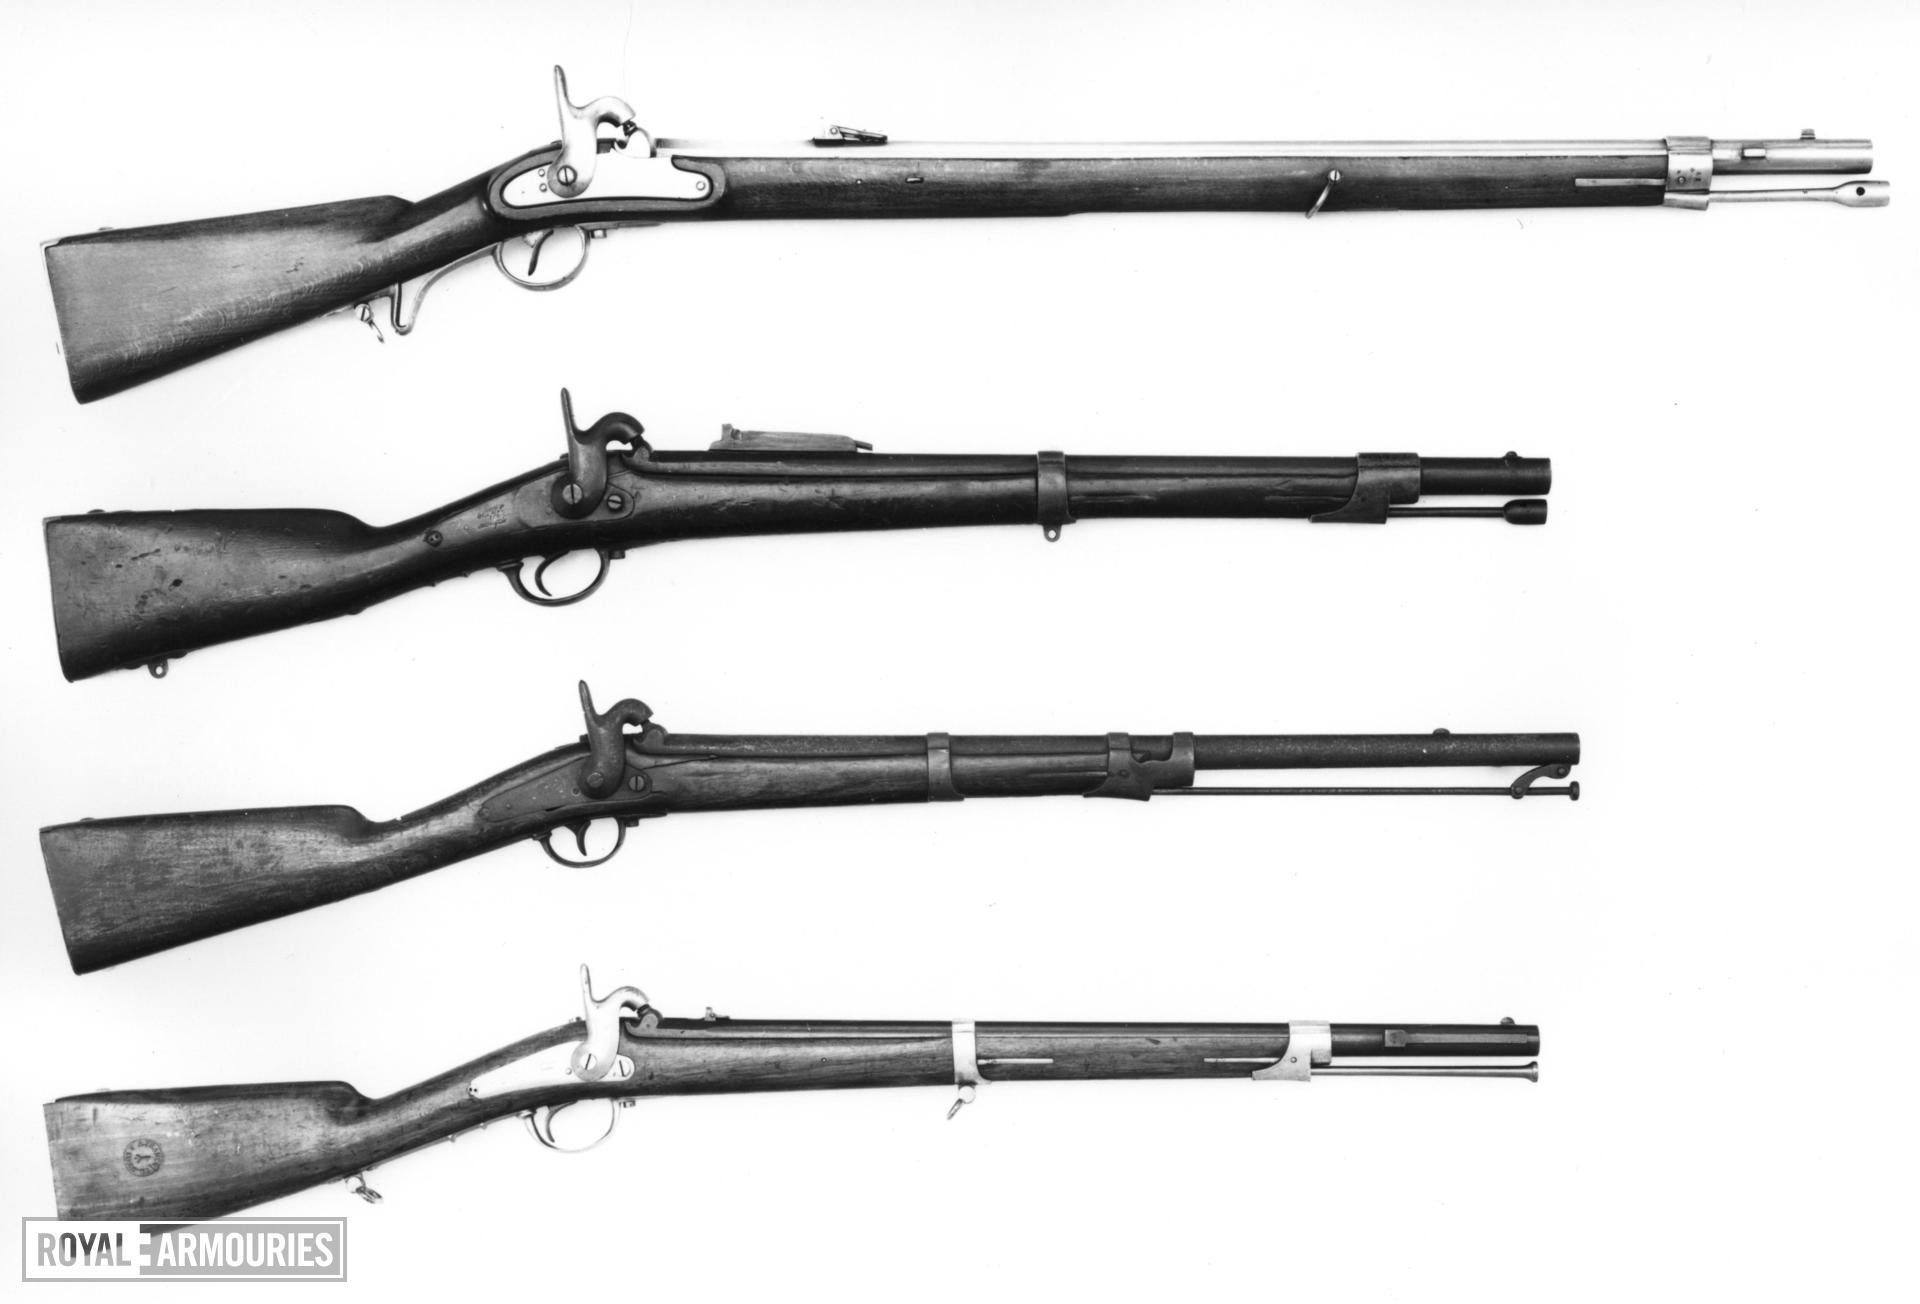 Percussion muzzle-loading military rifle - Neapolitan 32 inch, shortened